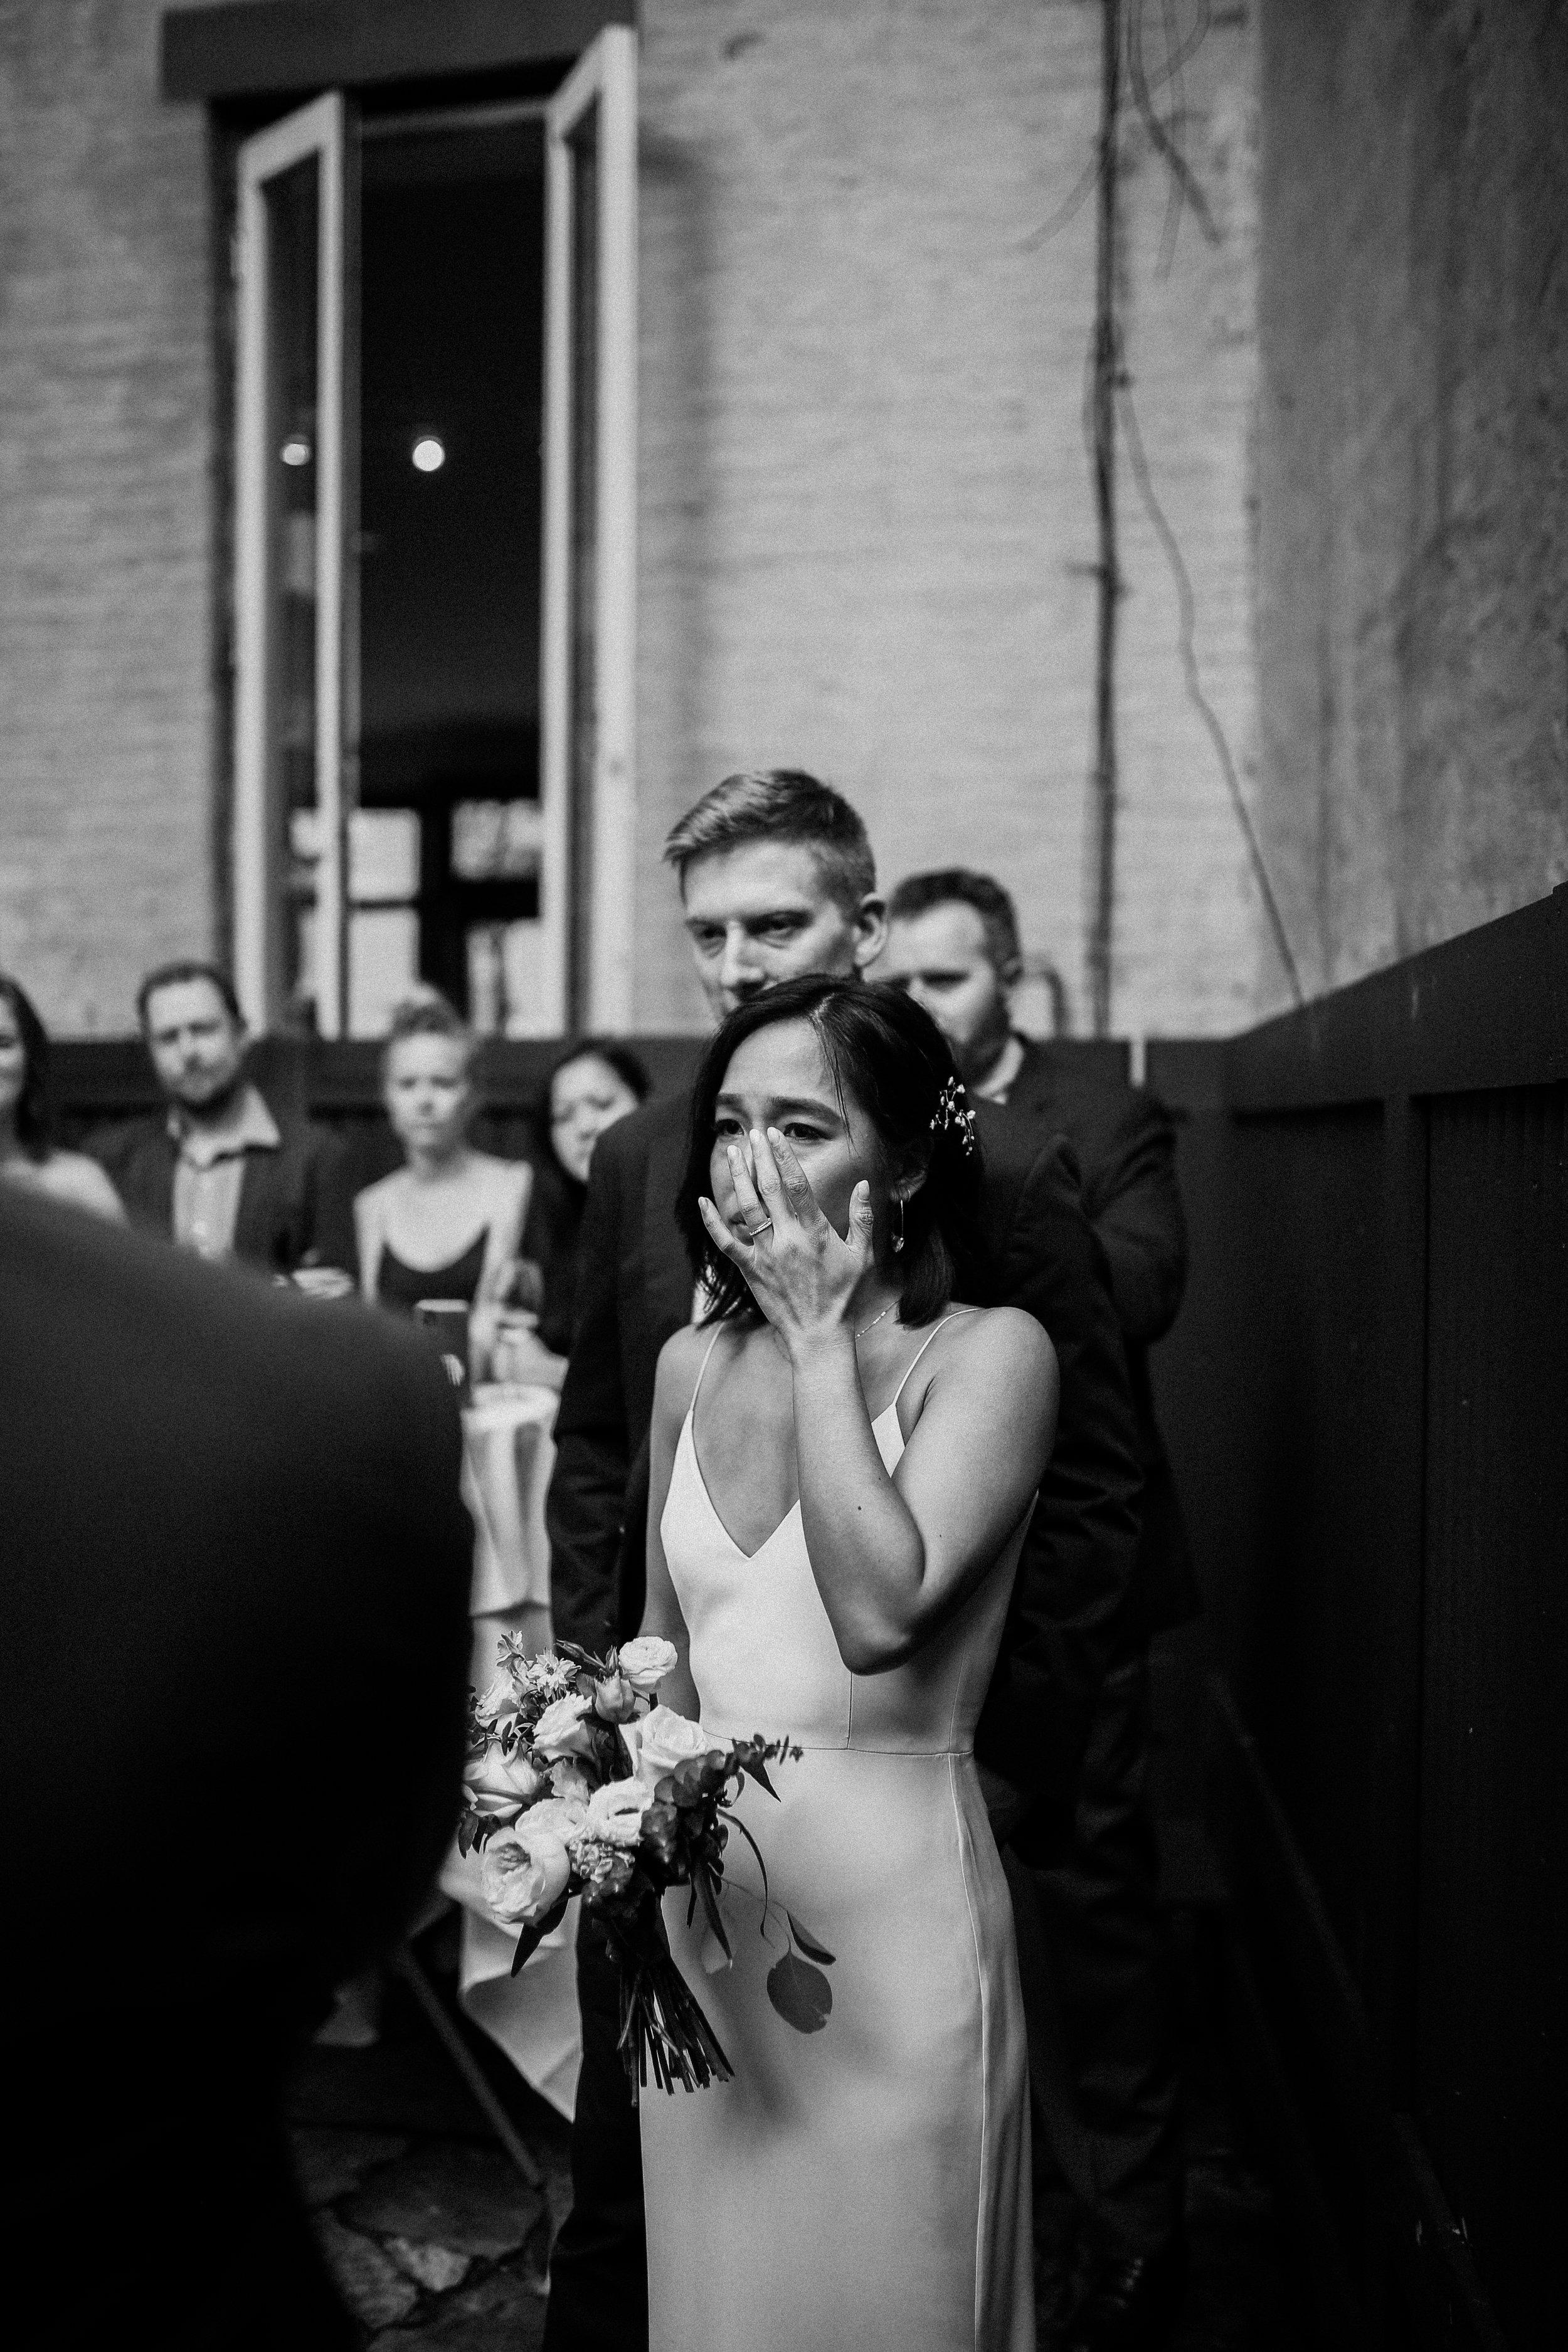 TheNichols_Married_2019-174.jpg